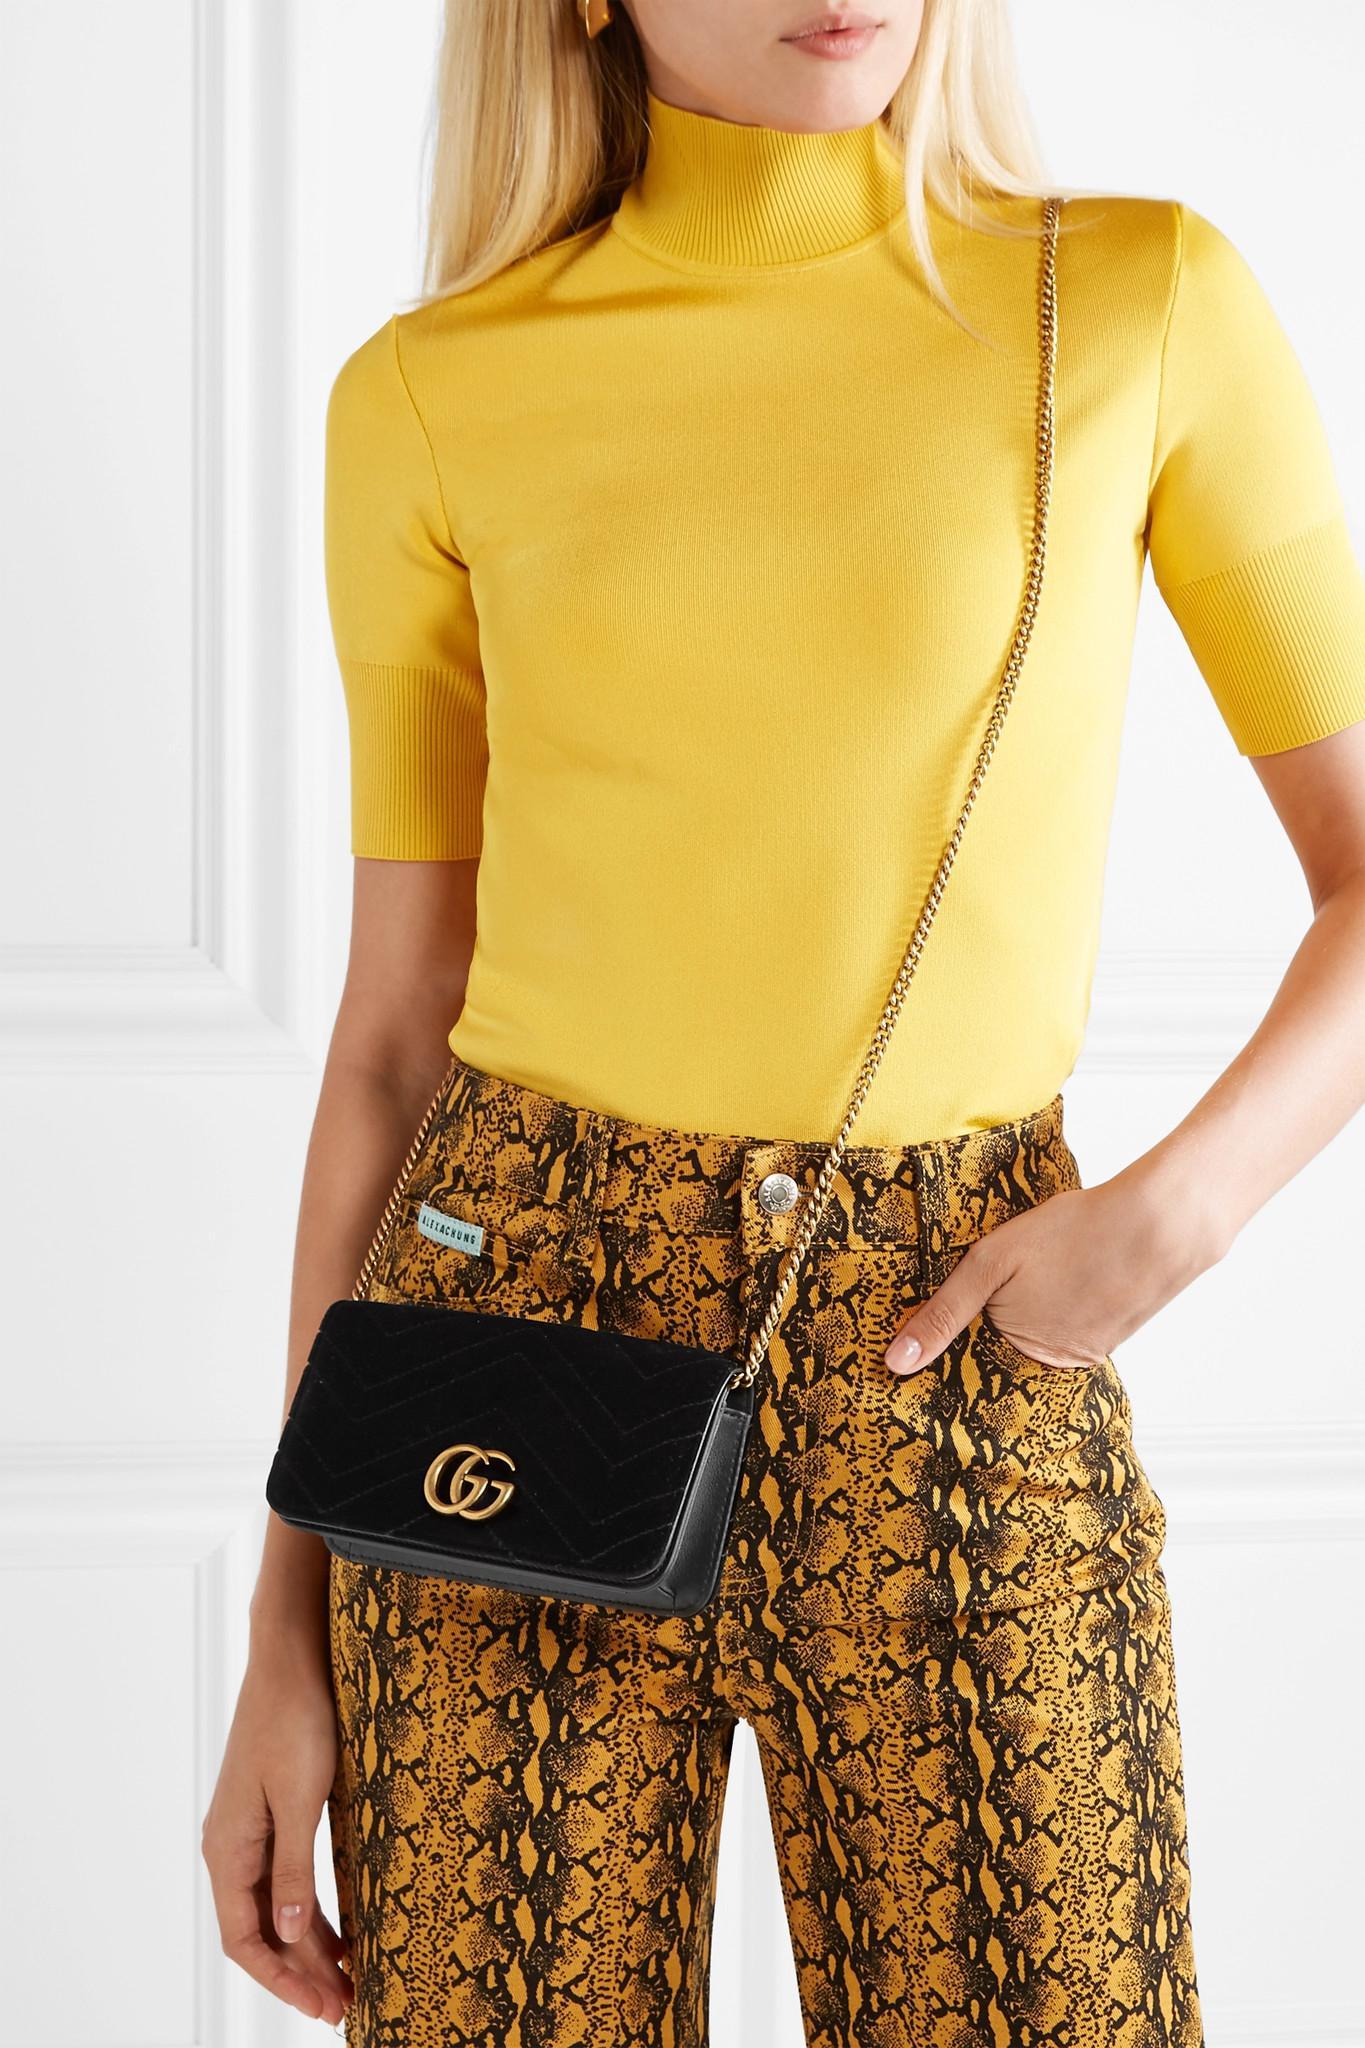 41ef8a36722e Gucci Gg Marmont 2.0 Matelassé Velvet Shoulder Bag in Black - Lyst